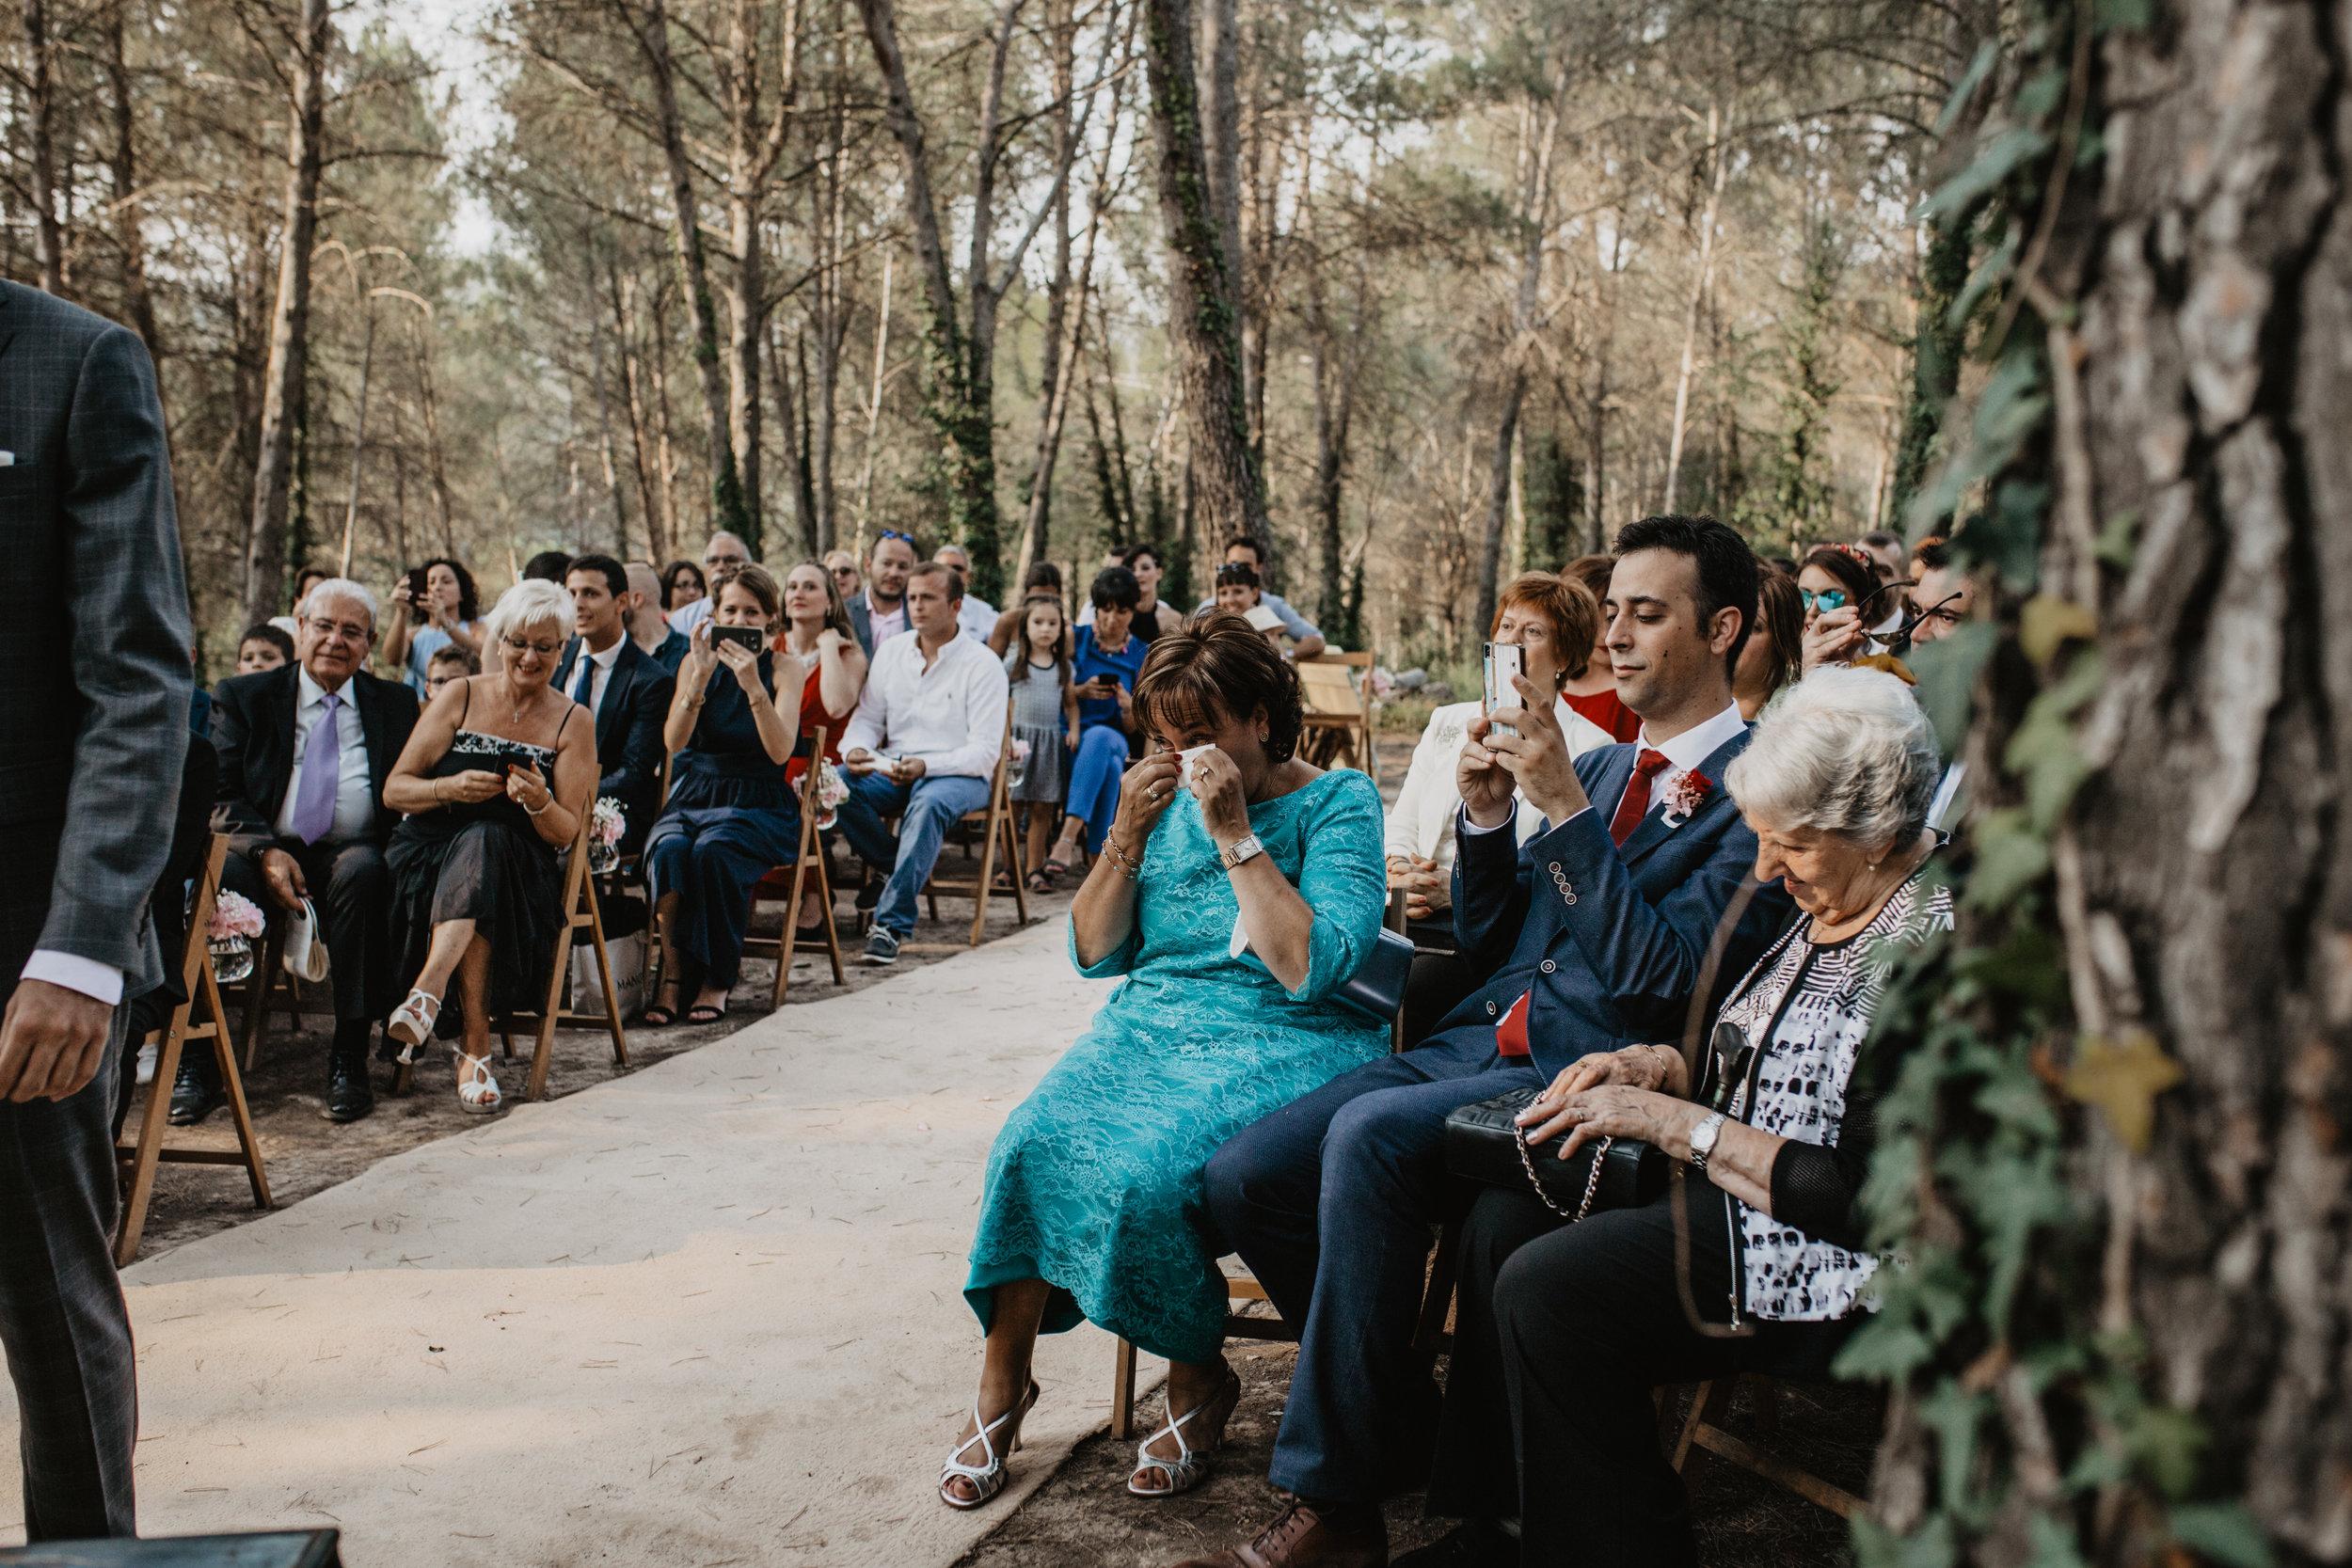 thenortherngirlphotography_photography_thenortherngirl_rebeccascabros_wedding_weddingphotography_masialagarrigadecastelladral_joaniemma_bodaenbarcelona_weddingphotographer_emmaijoan-300.jpg